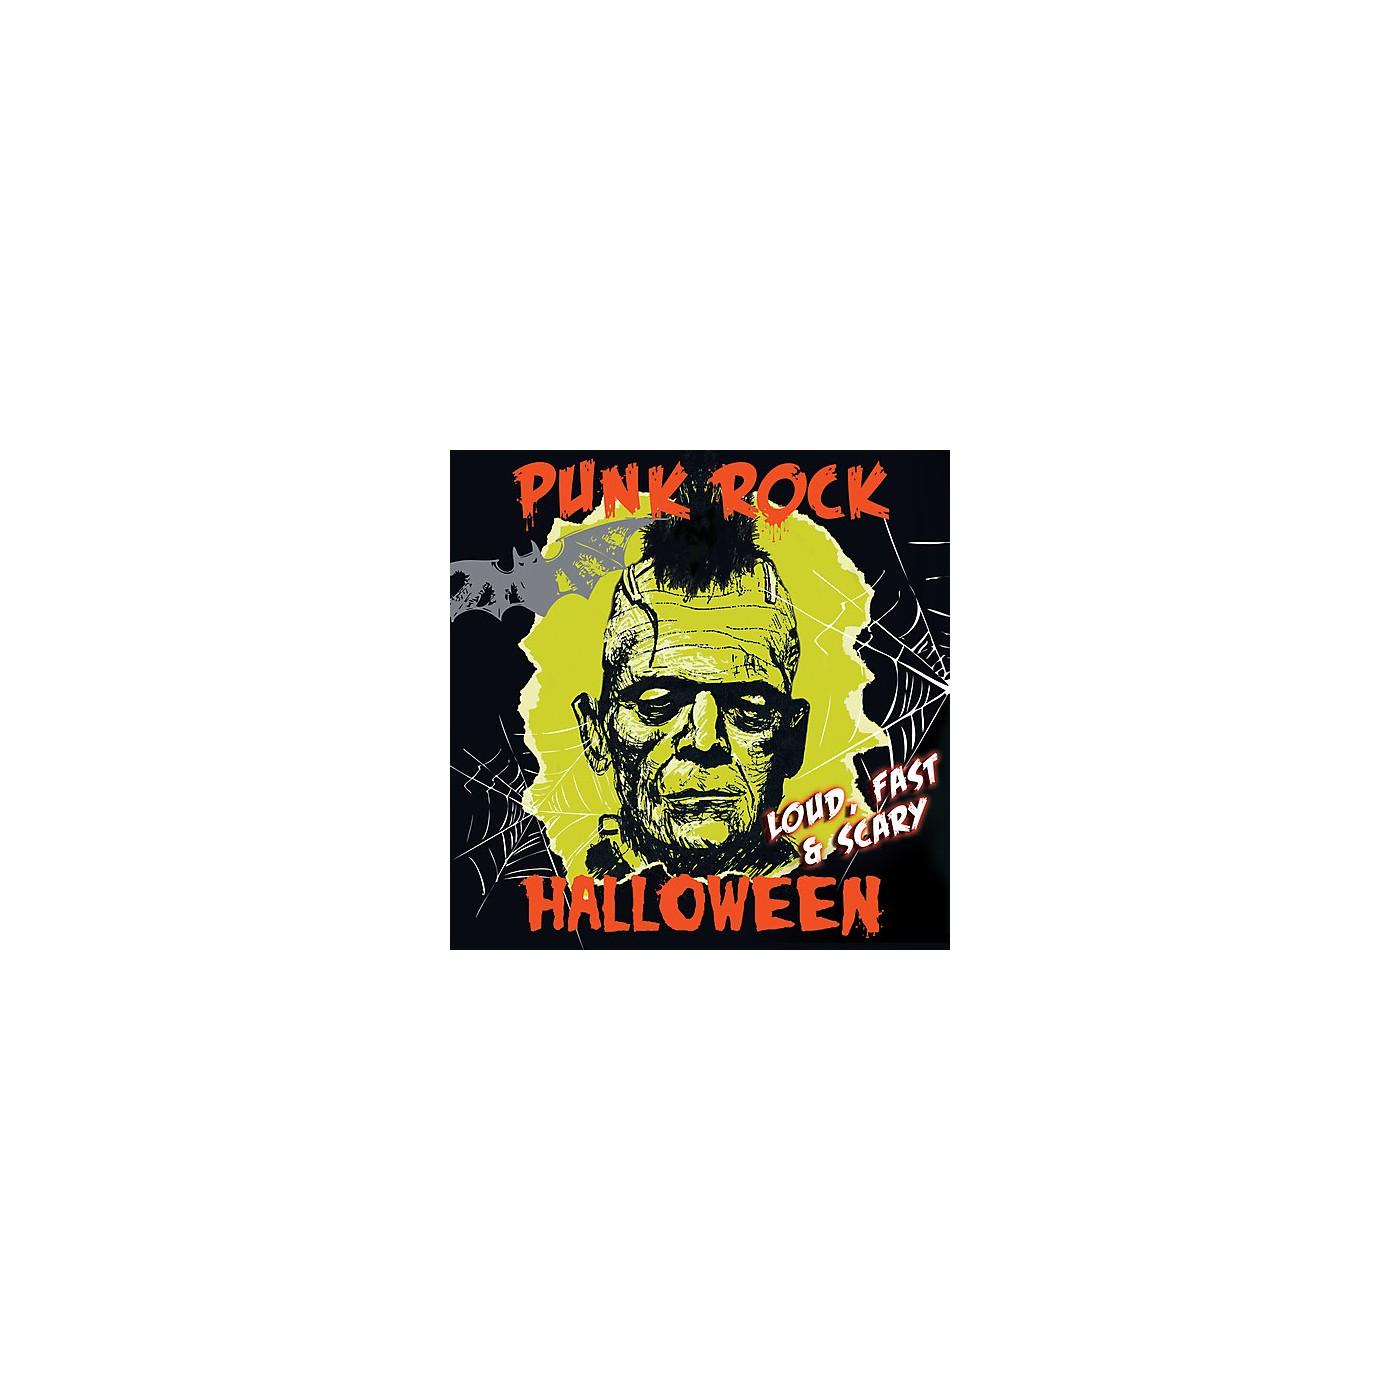 Alliance Various Artists - Punk Rock Halloween - Loud Fast & Scary! thumbnail